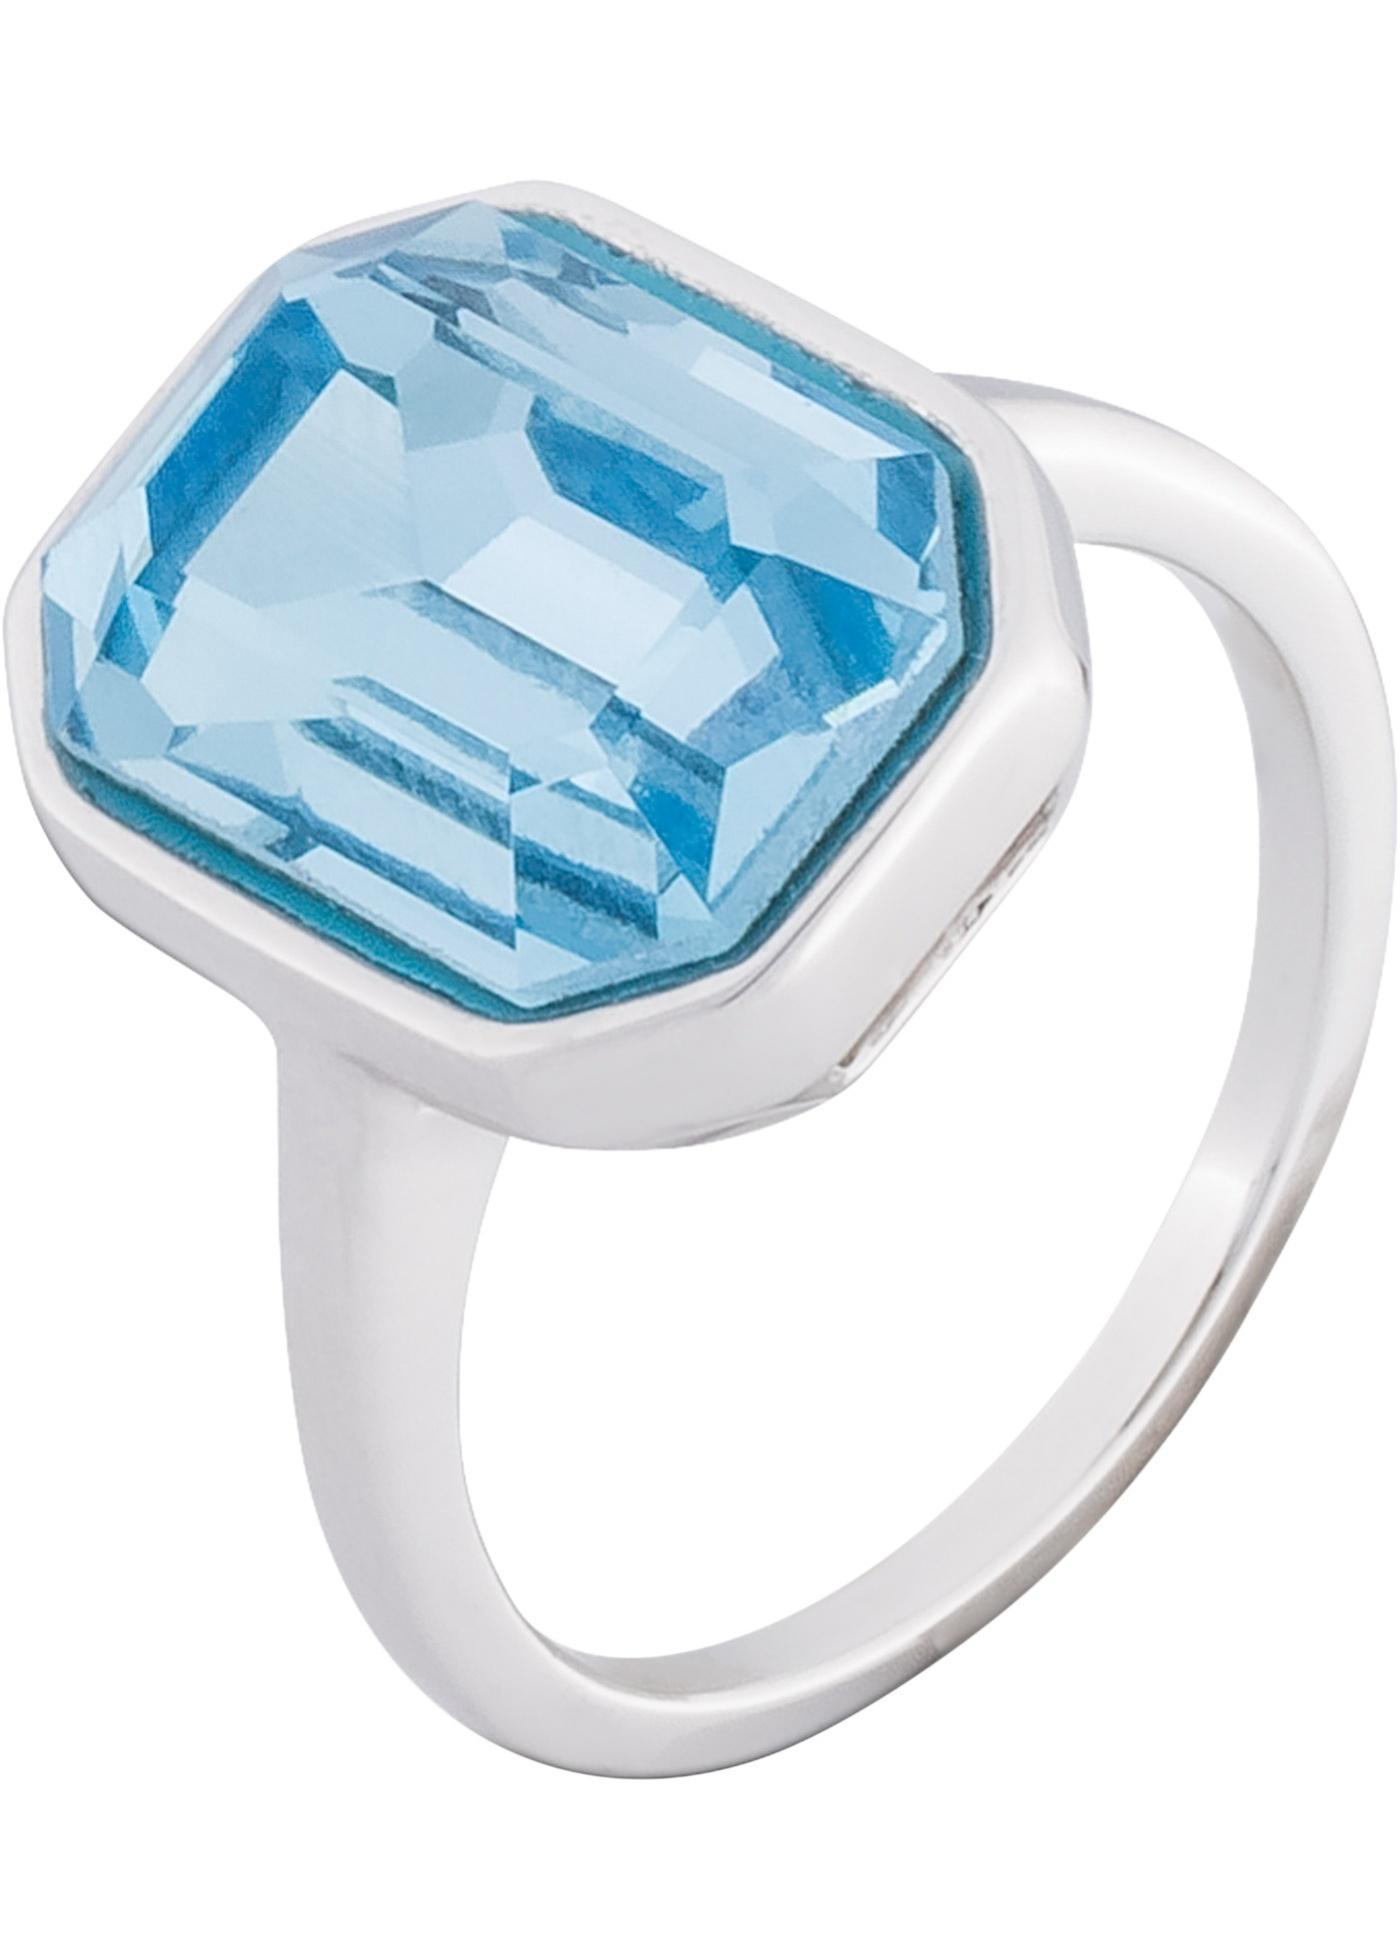 Anello con cristallo Swar